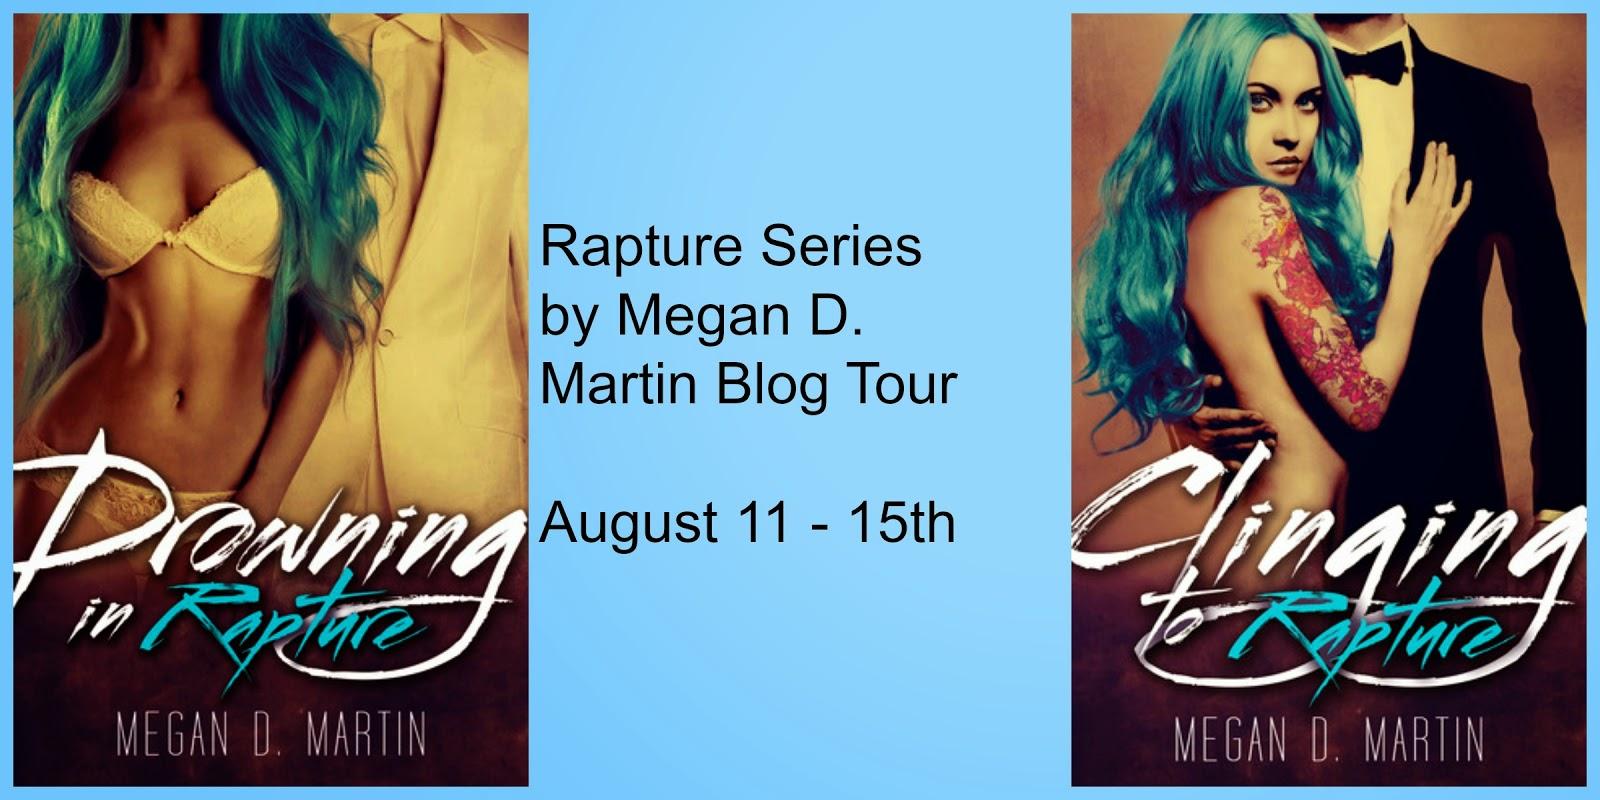 Rapture Series by Megan D. Martin Blog Tour Review & Giveaway